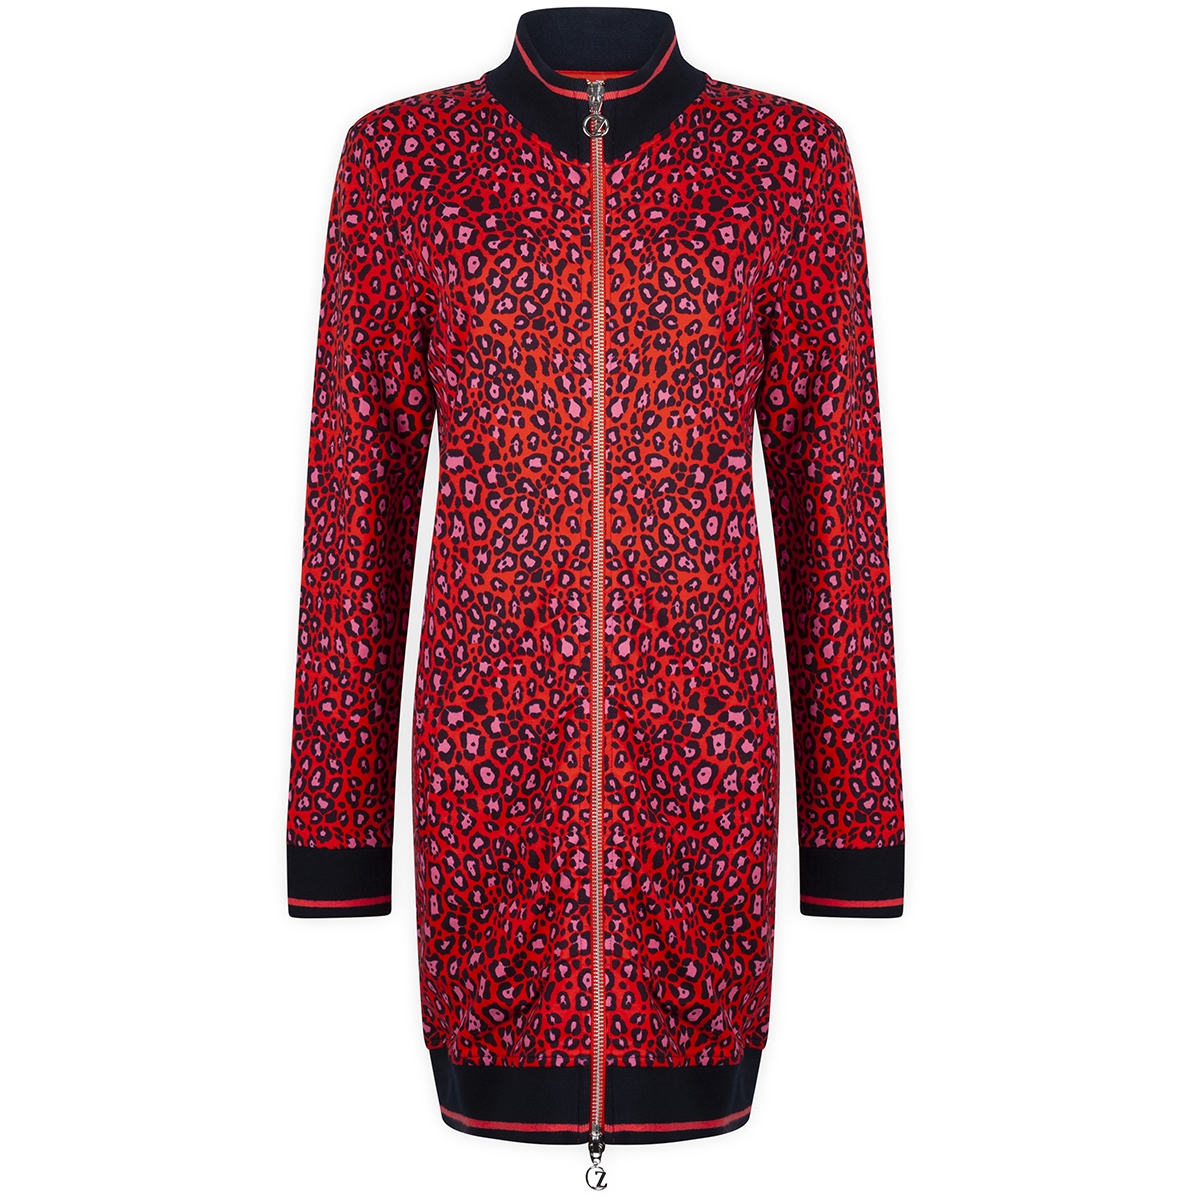 sporty cardigan sr1907 zoso jurk orange red/navy